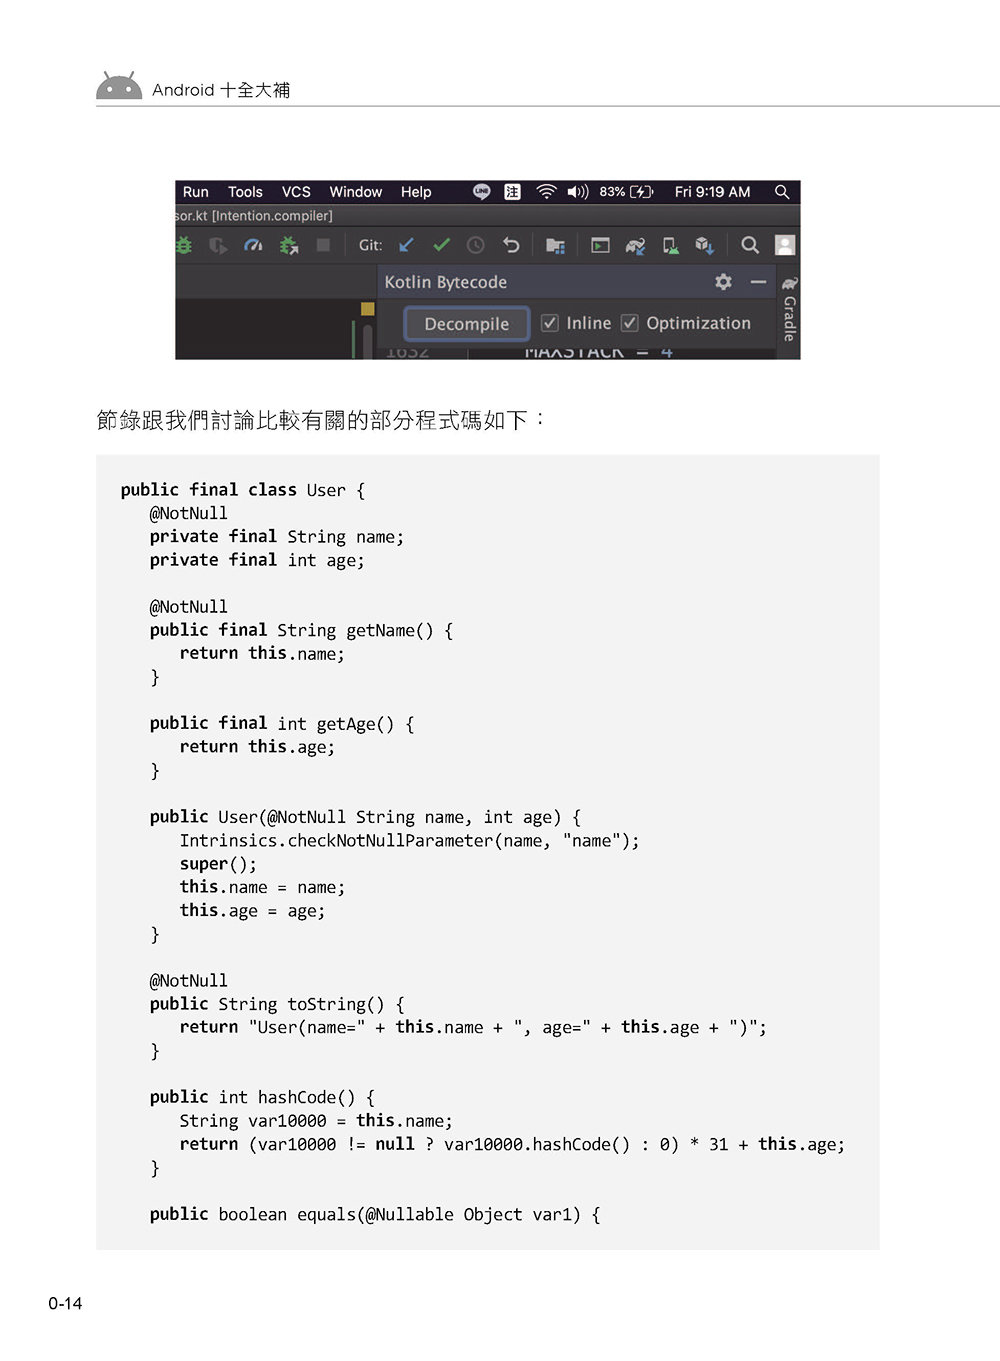 Android 十全大補:從 Kotlin、MVVM 到測試的全方面介紹(iT邦幫忙鐵人賽系列書)-preview-16